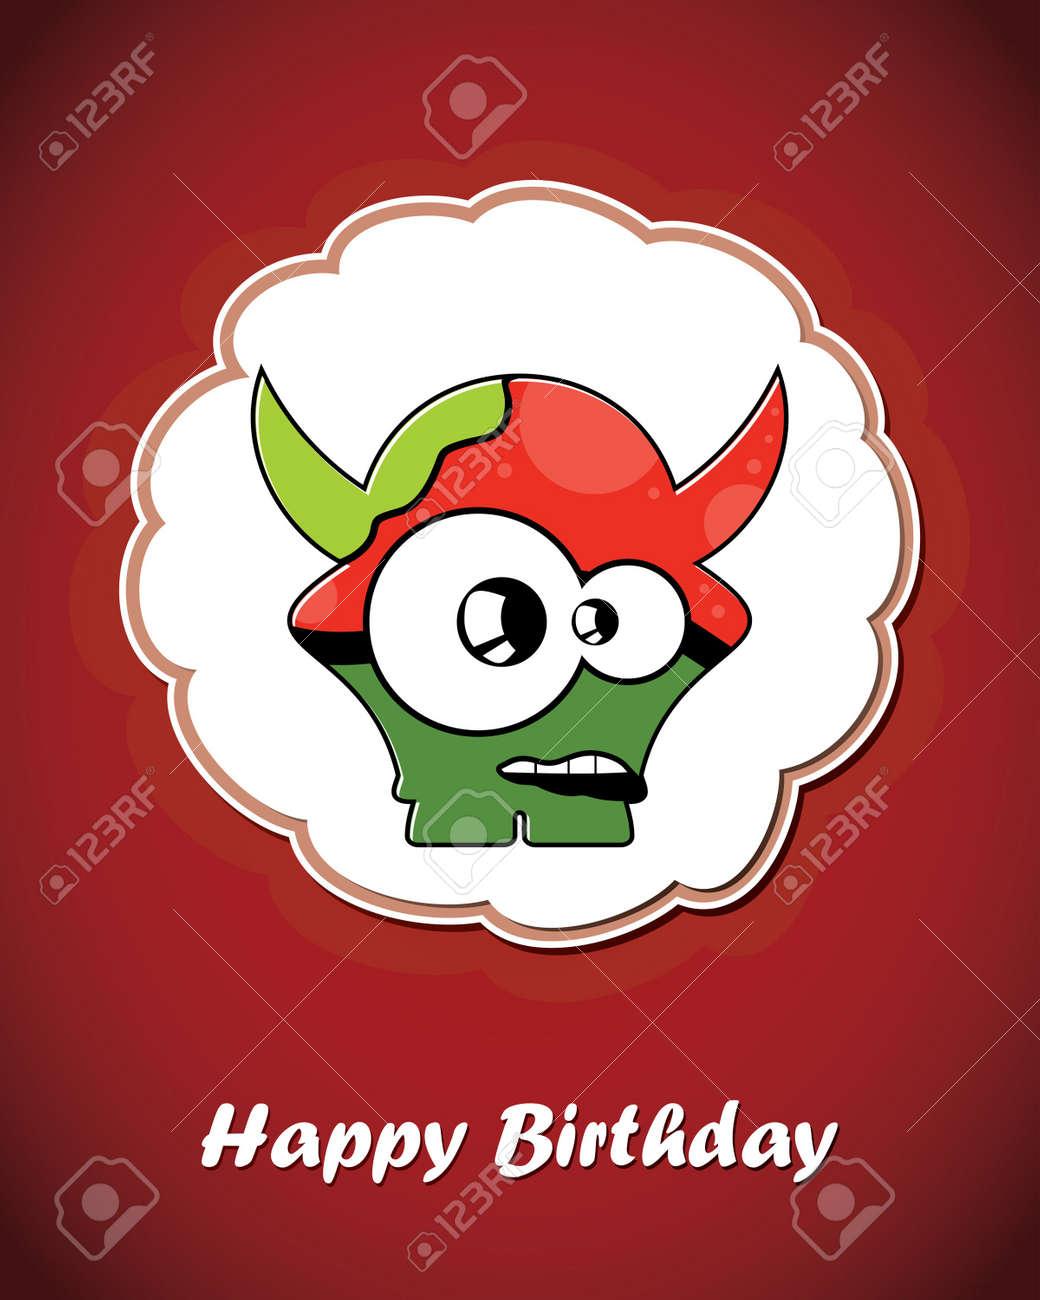 Happy birthday card with cute cartoon monster Stock Vector - 17577643